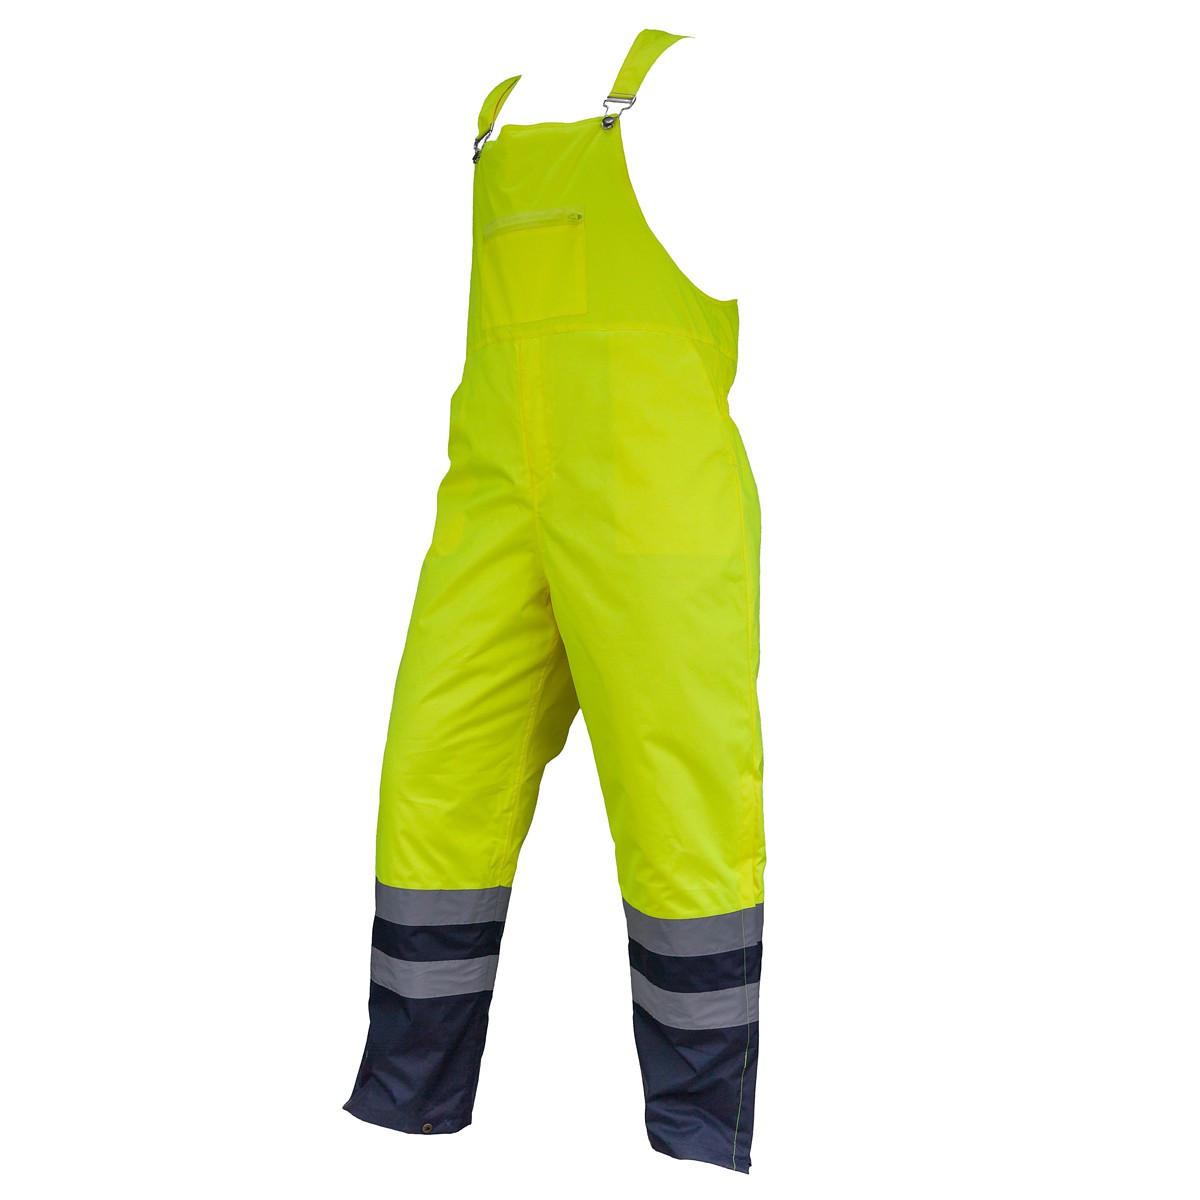 Предупреждающие брюки SPODNIE OGRODNICZKI HSV YELLOW водоотталкивающие  Urgent (POLAND)